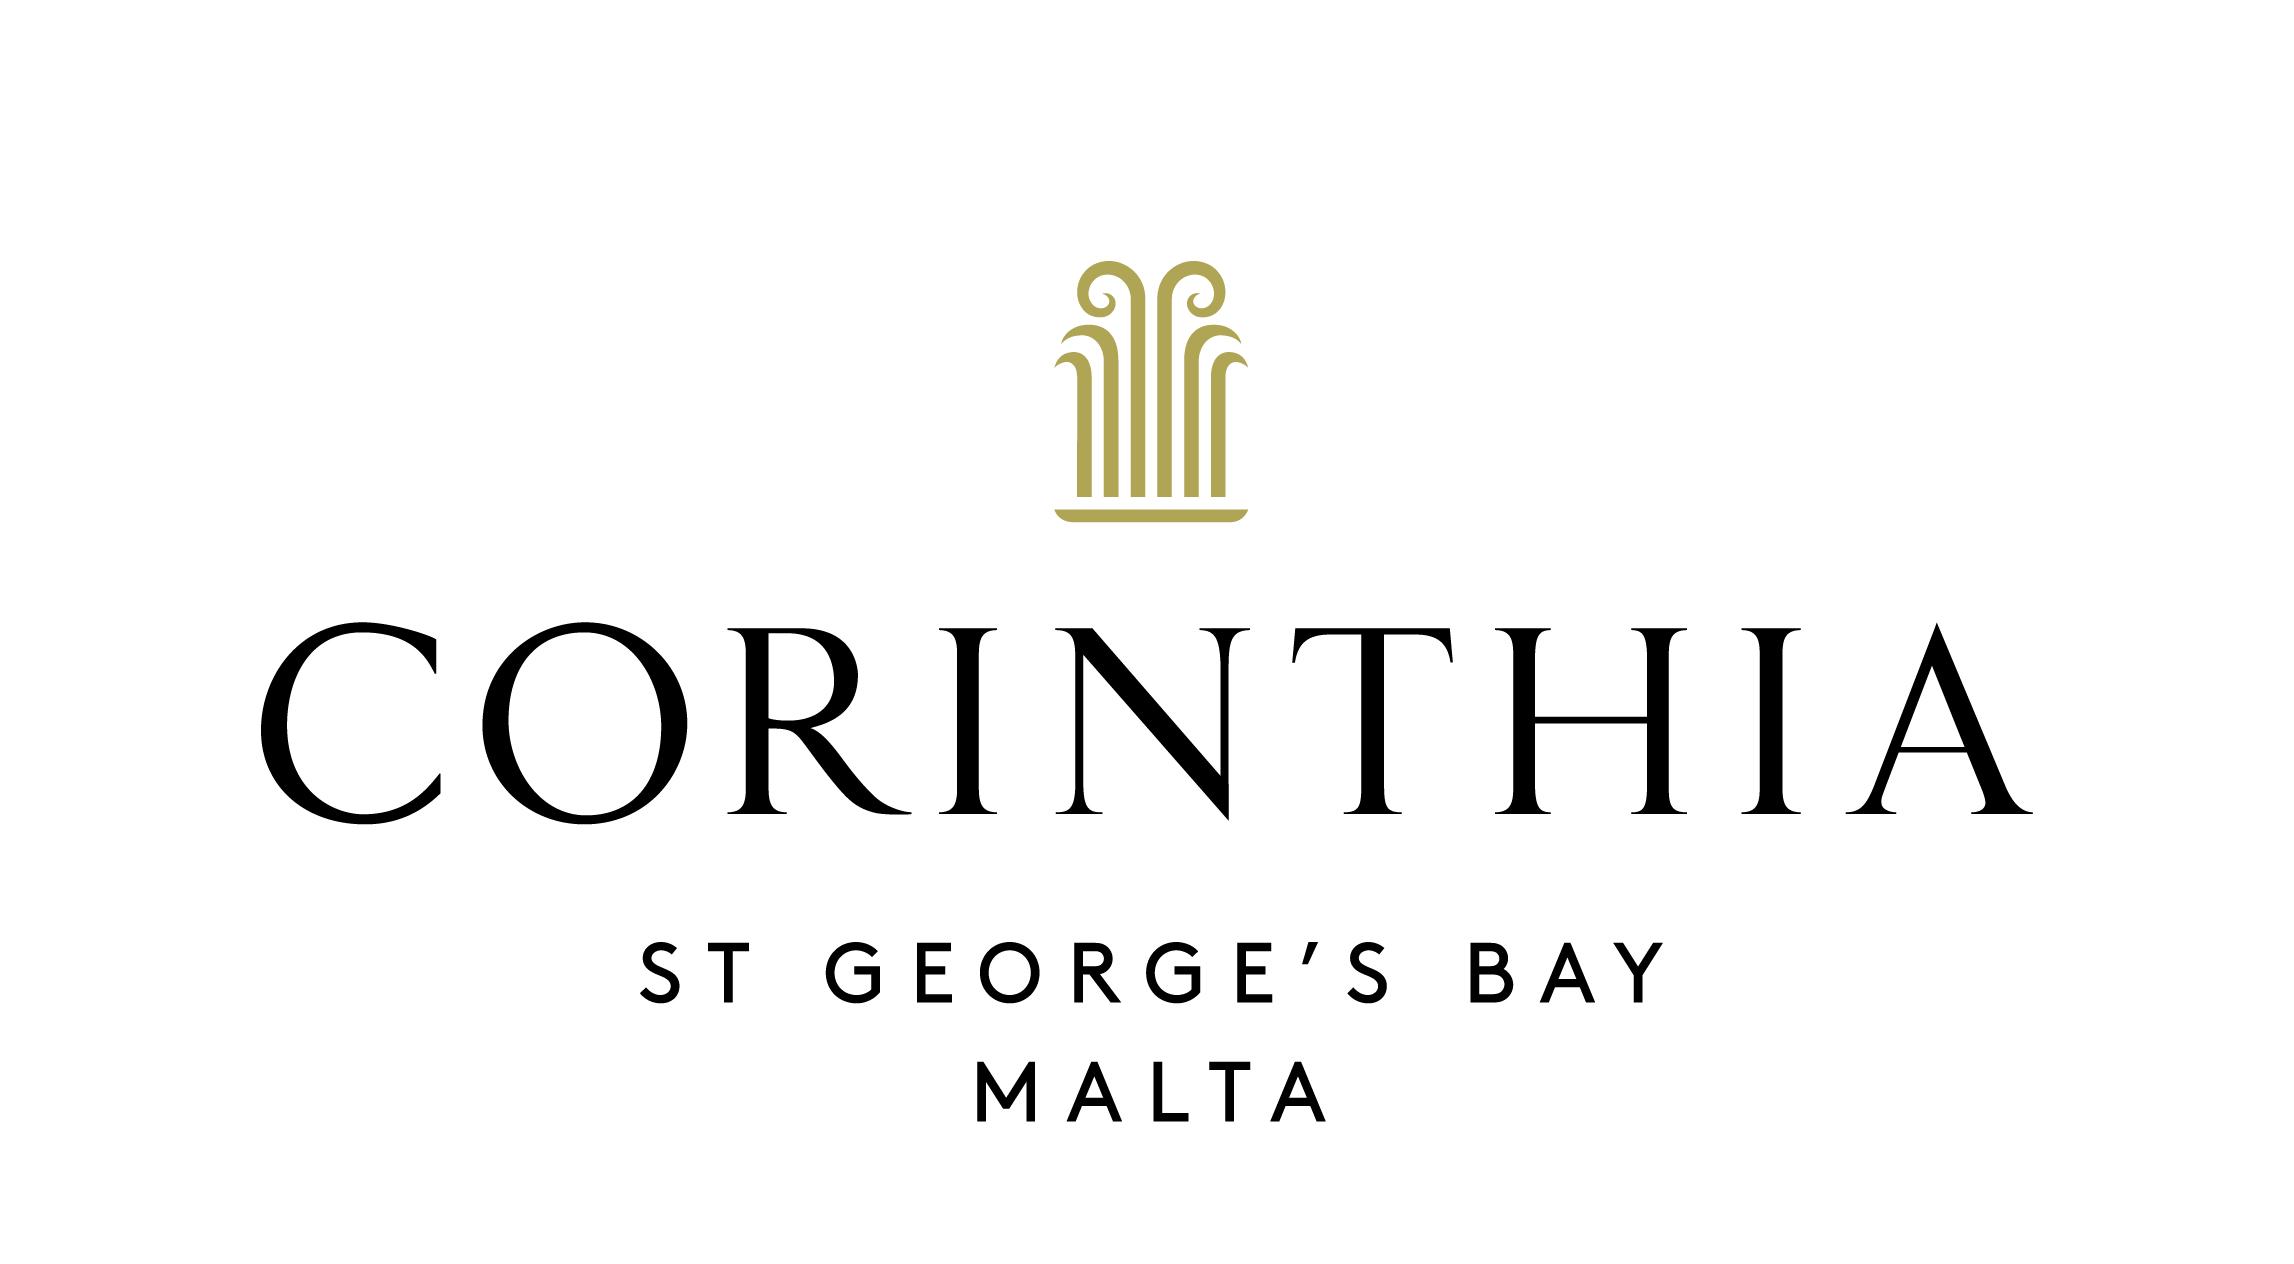 Corinthia St. Georges Bay